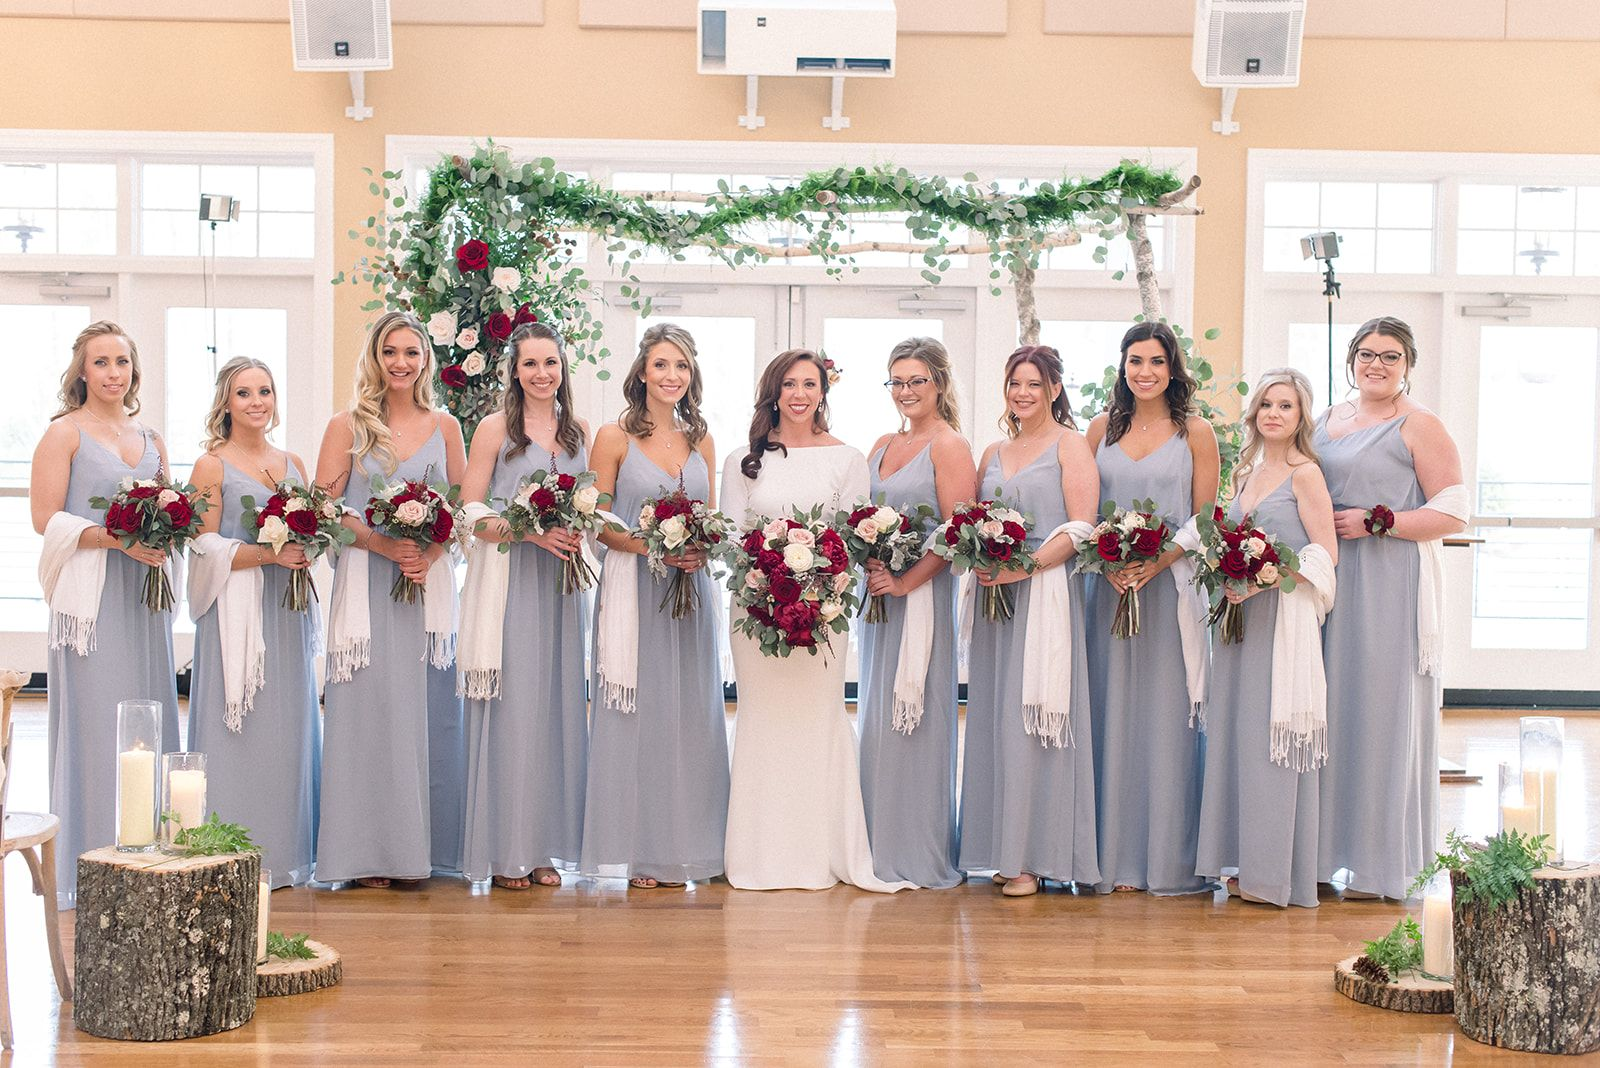 Light grey bridesmaid dresses